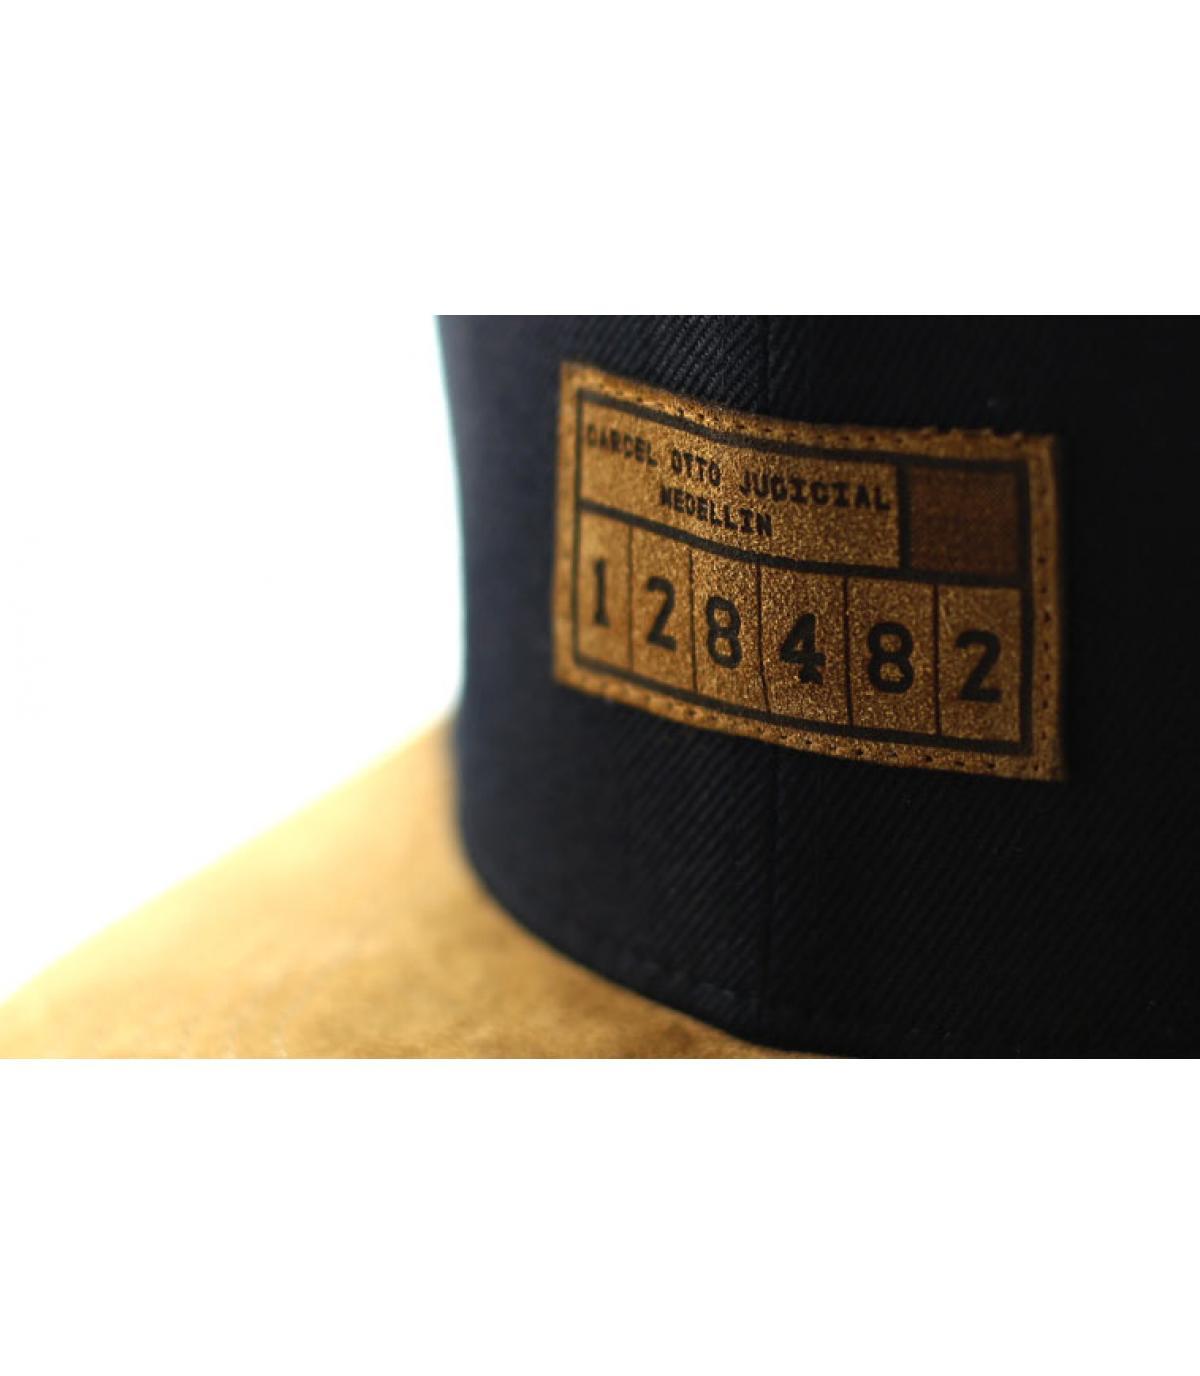 Details Snapback 128482 black suede - Abbildung 3